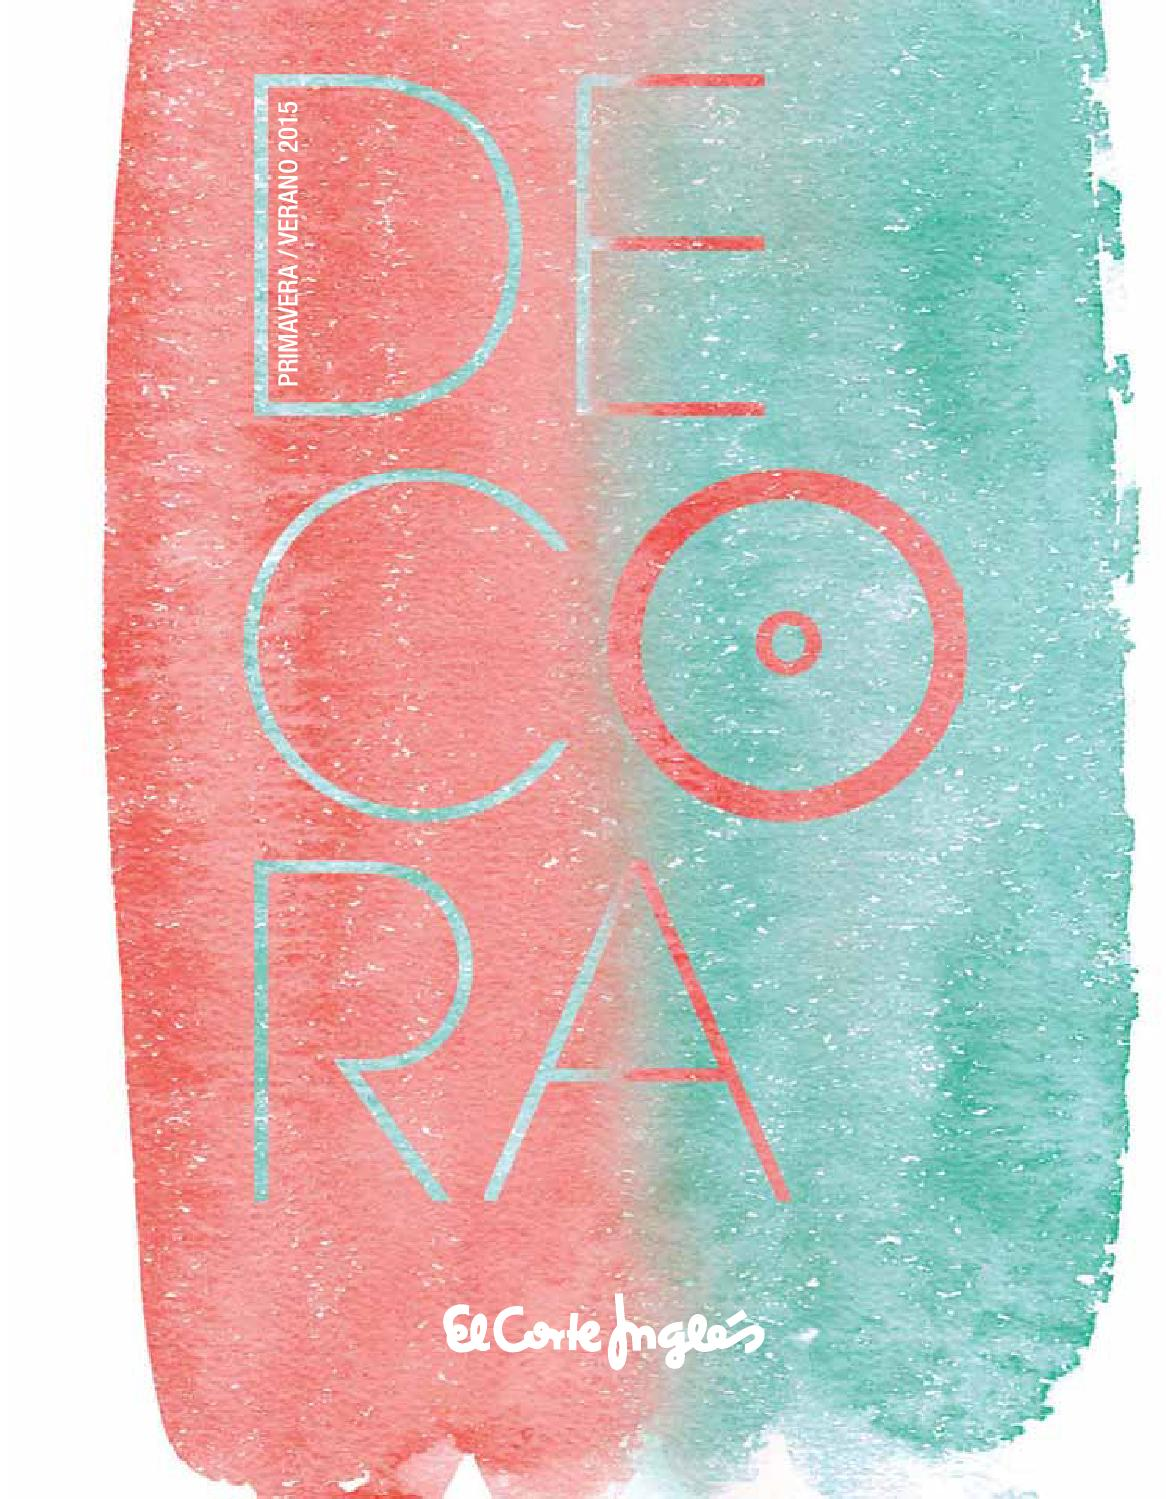 El corte ingl s decora 2015 by andr gon alves issuu - Decora el corte ingles ...